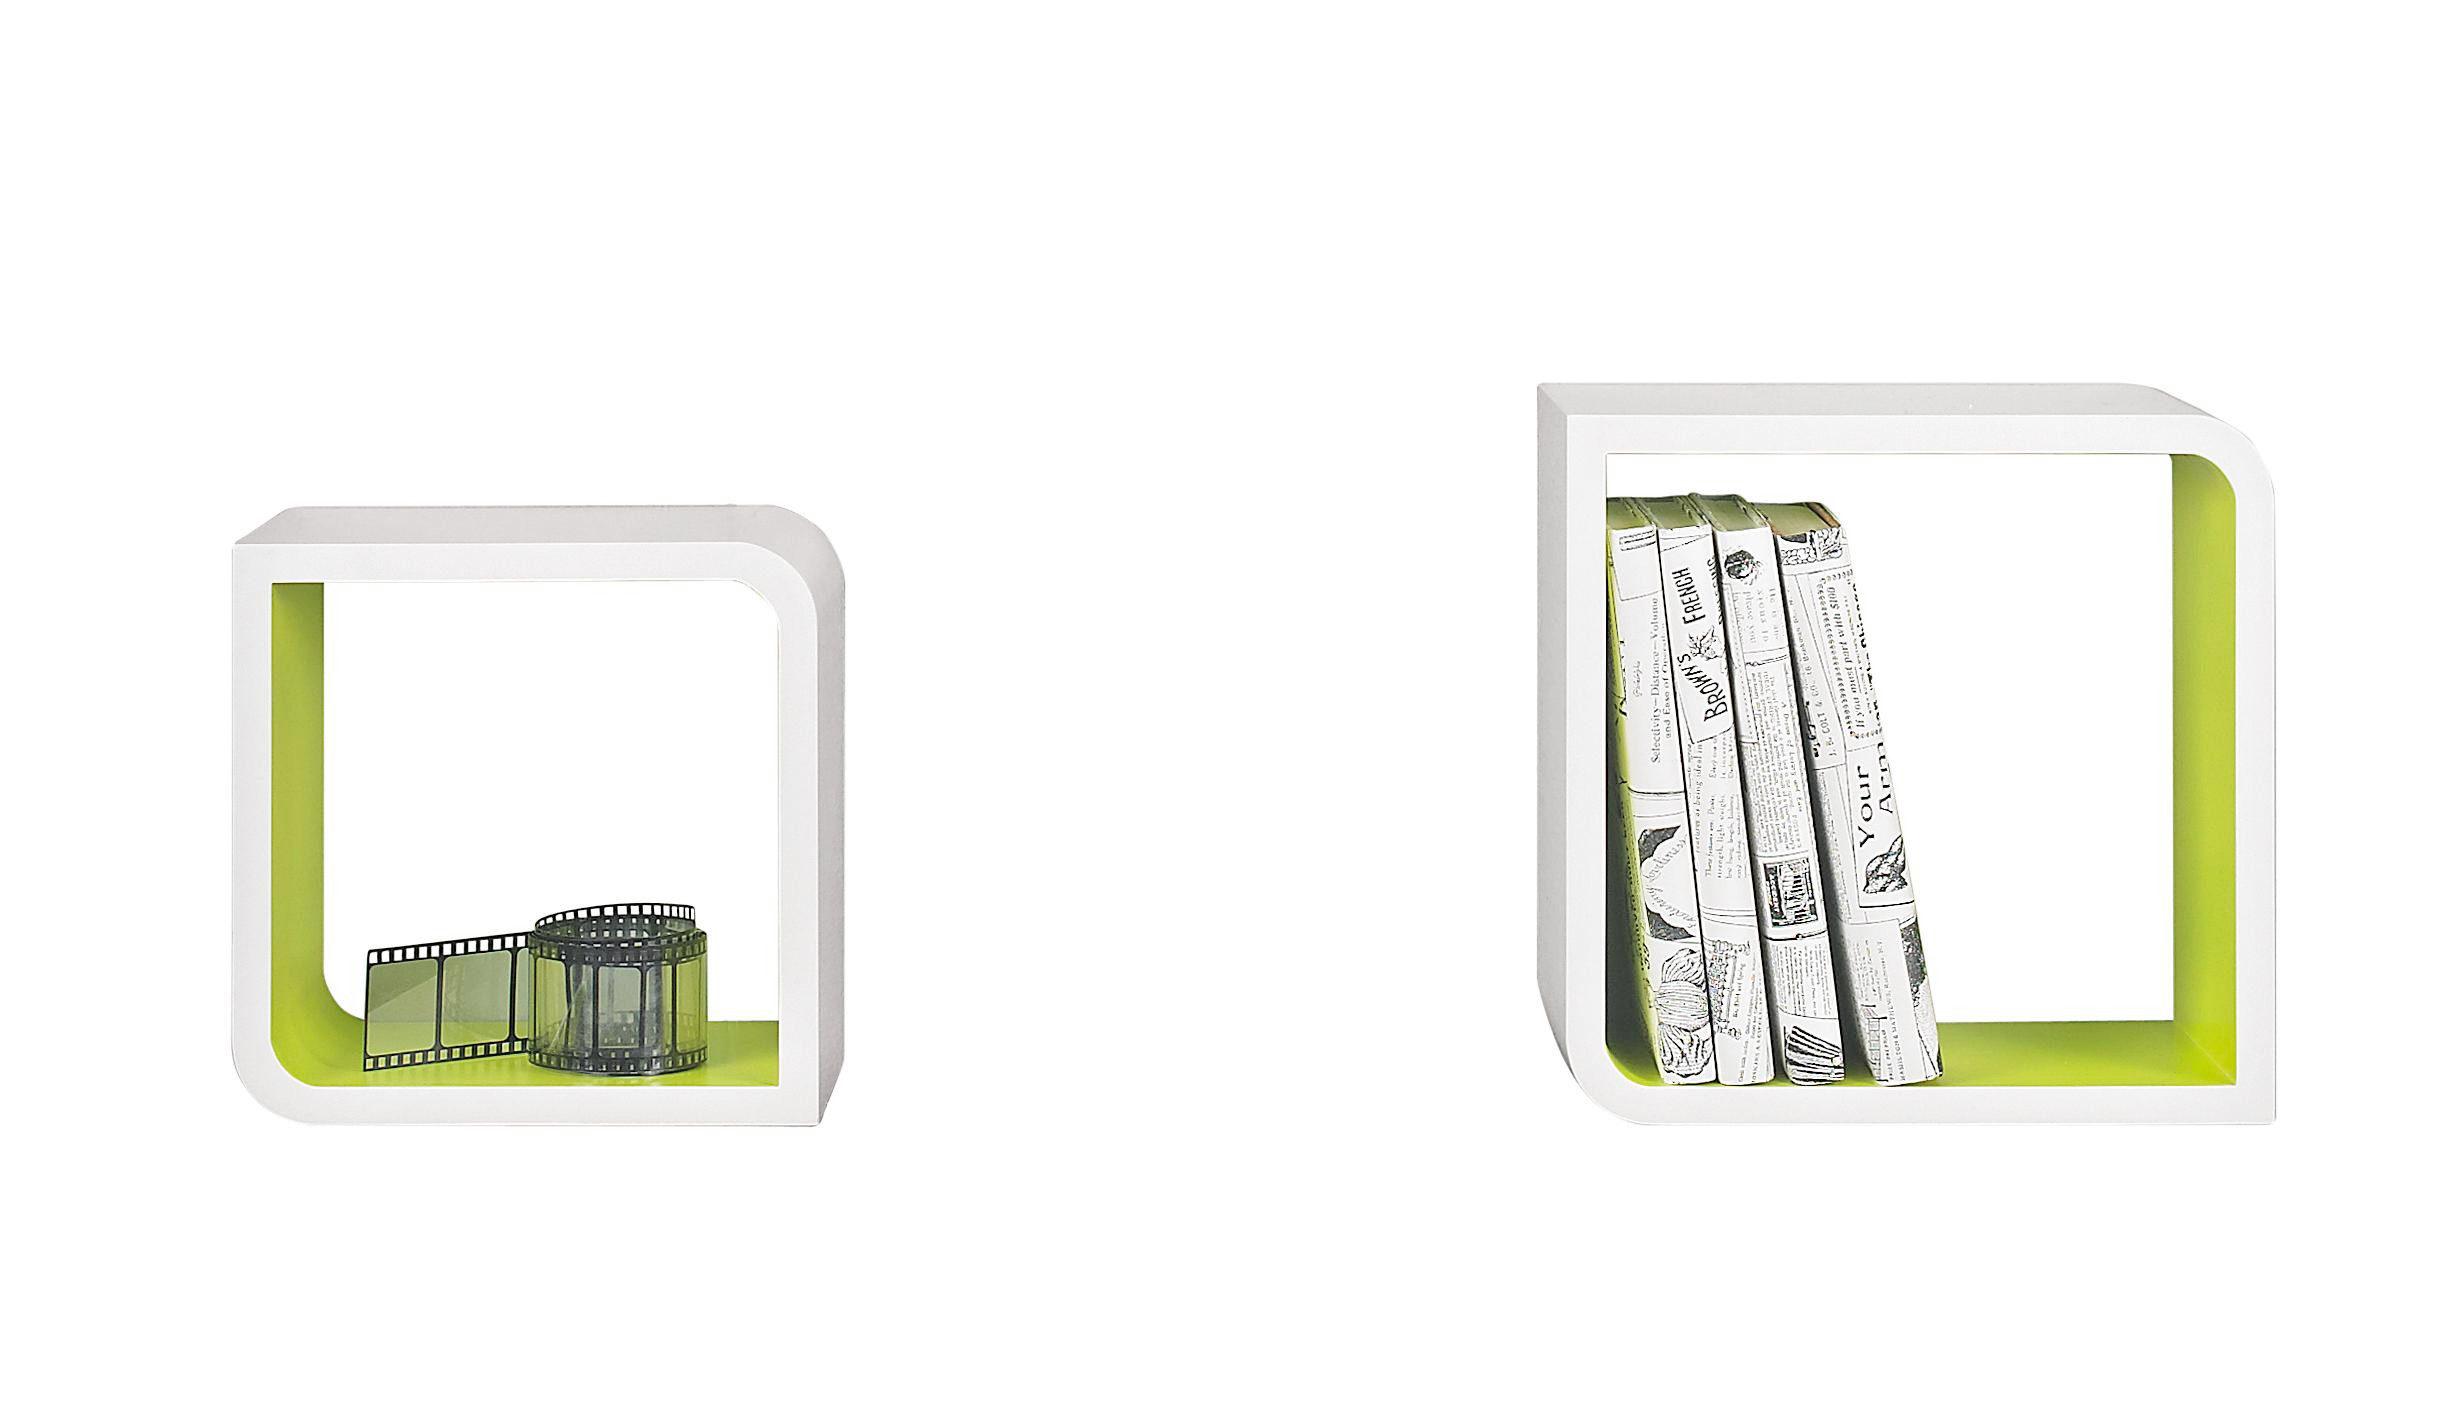 VÄGGHYLLA SET - vit/grön, Design, träbaserade material (28/28/15cm) - Boxxx